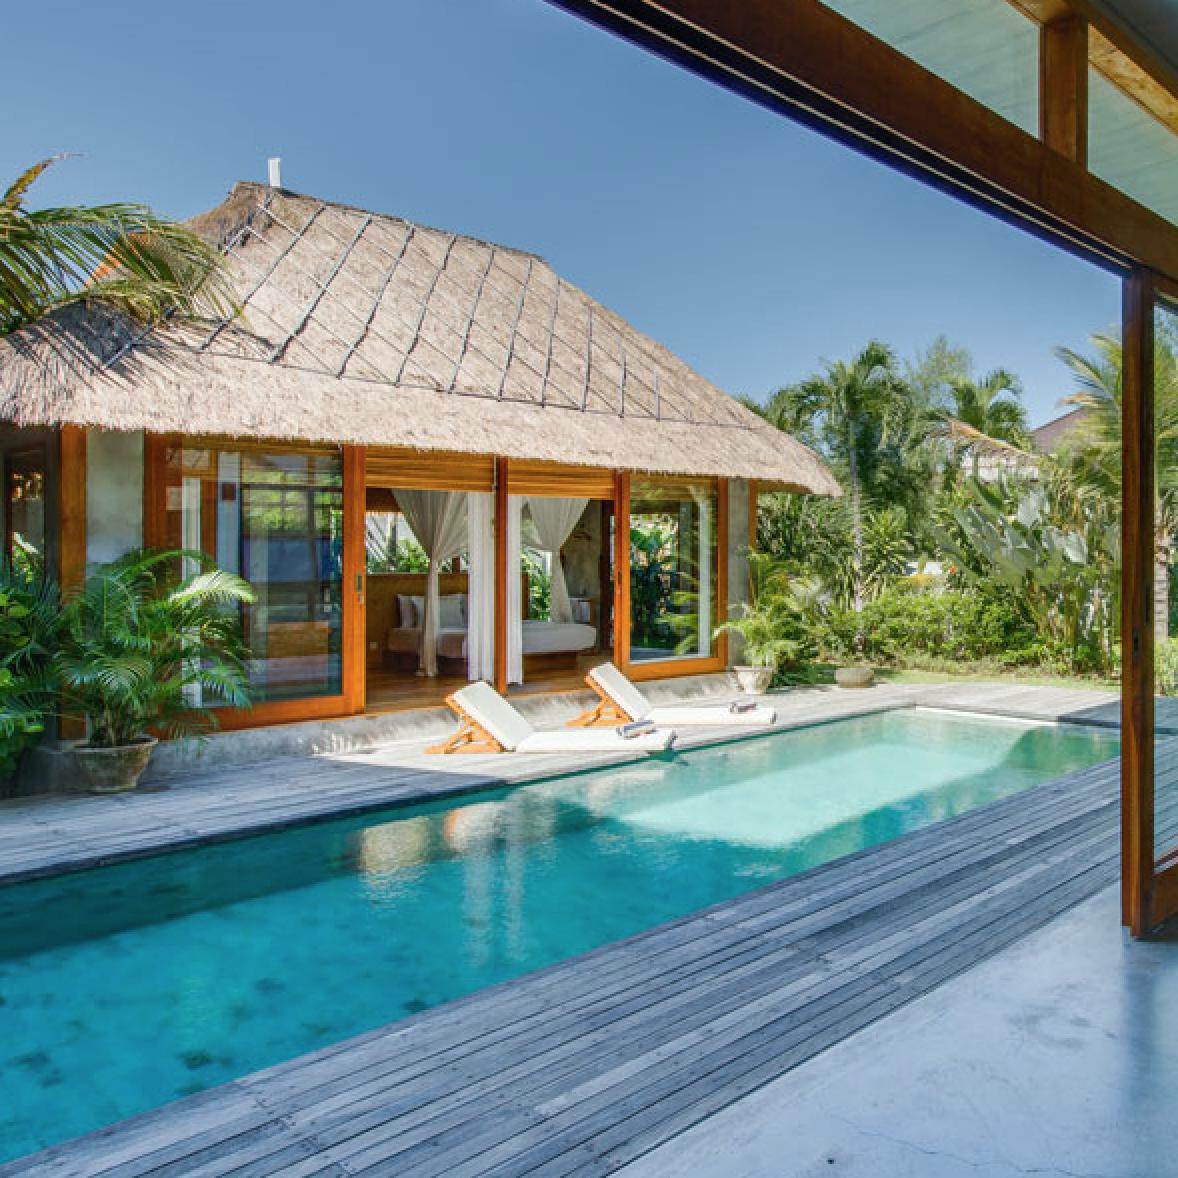 PURI BEJI VILLAS, CANGGU, 4 bedrooms, $450 – $700 per night